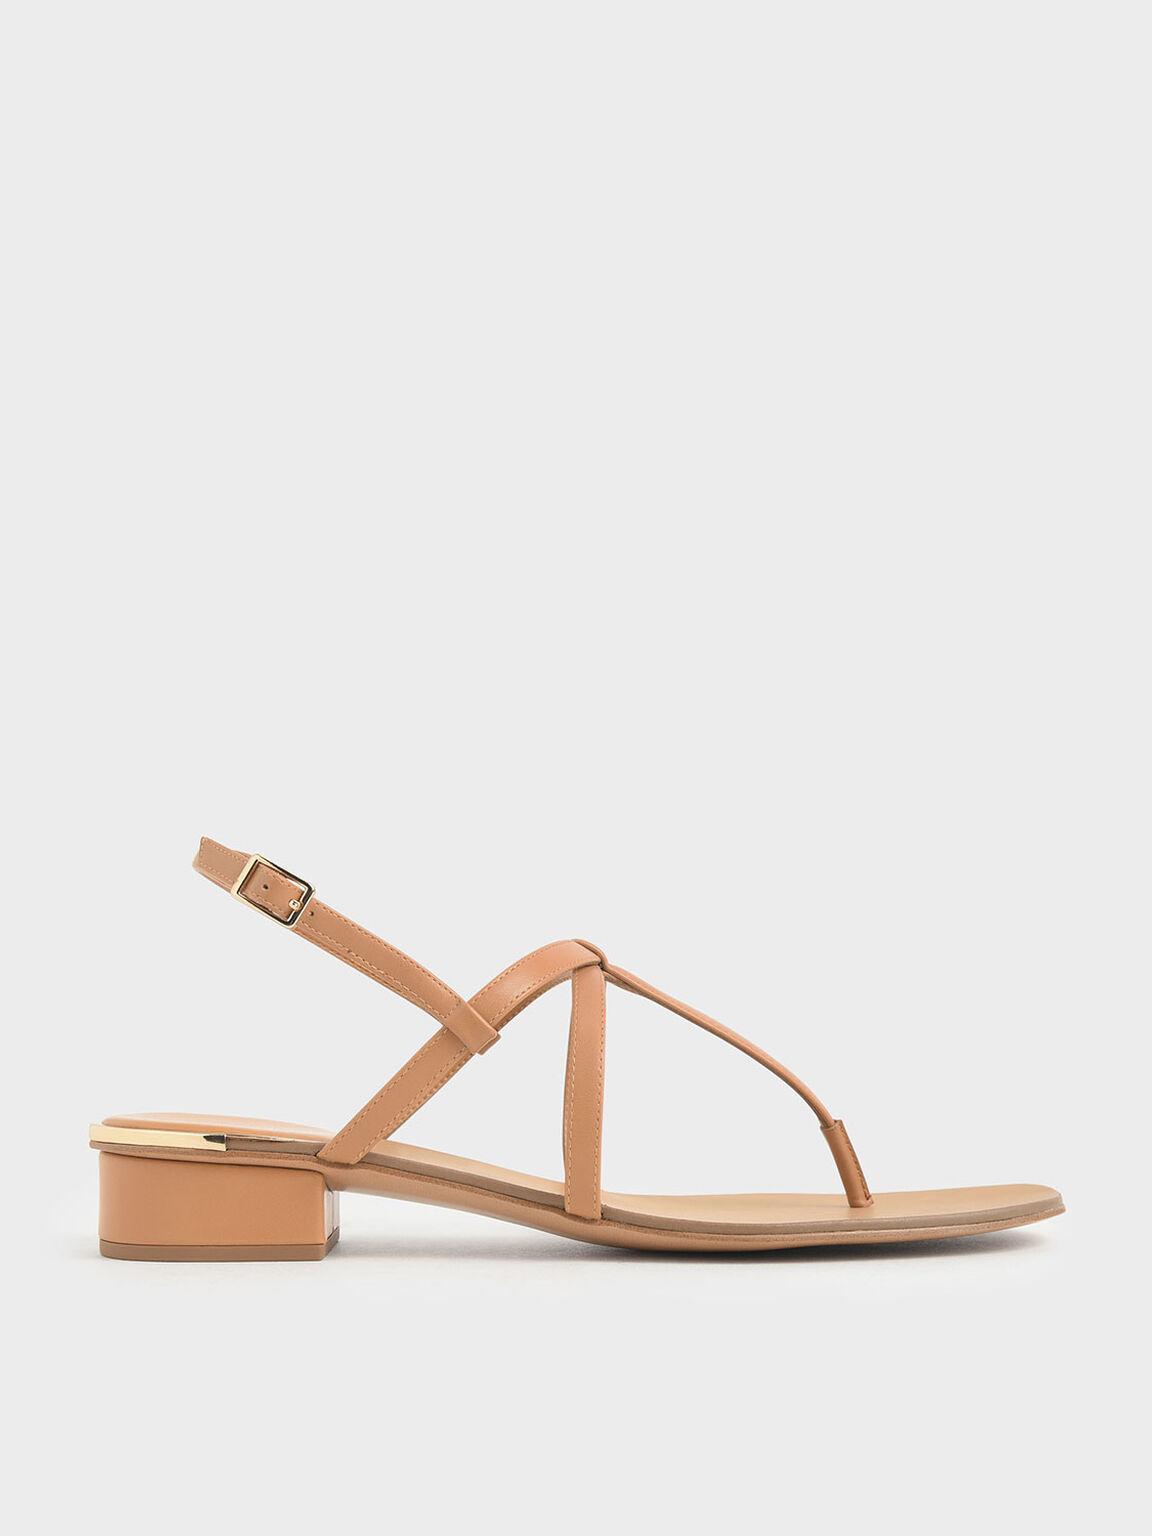 Strappy T-Bar Sandals, Orange, hi-res